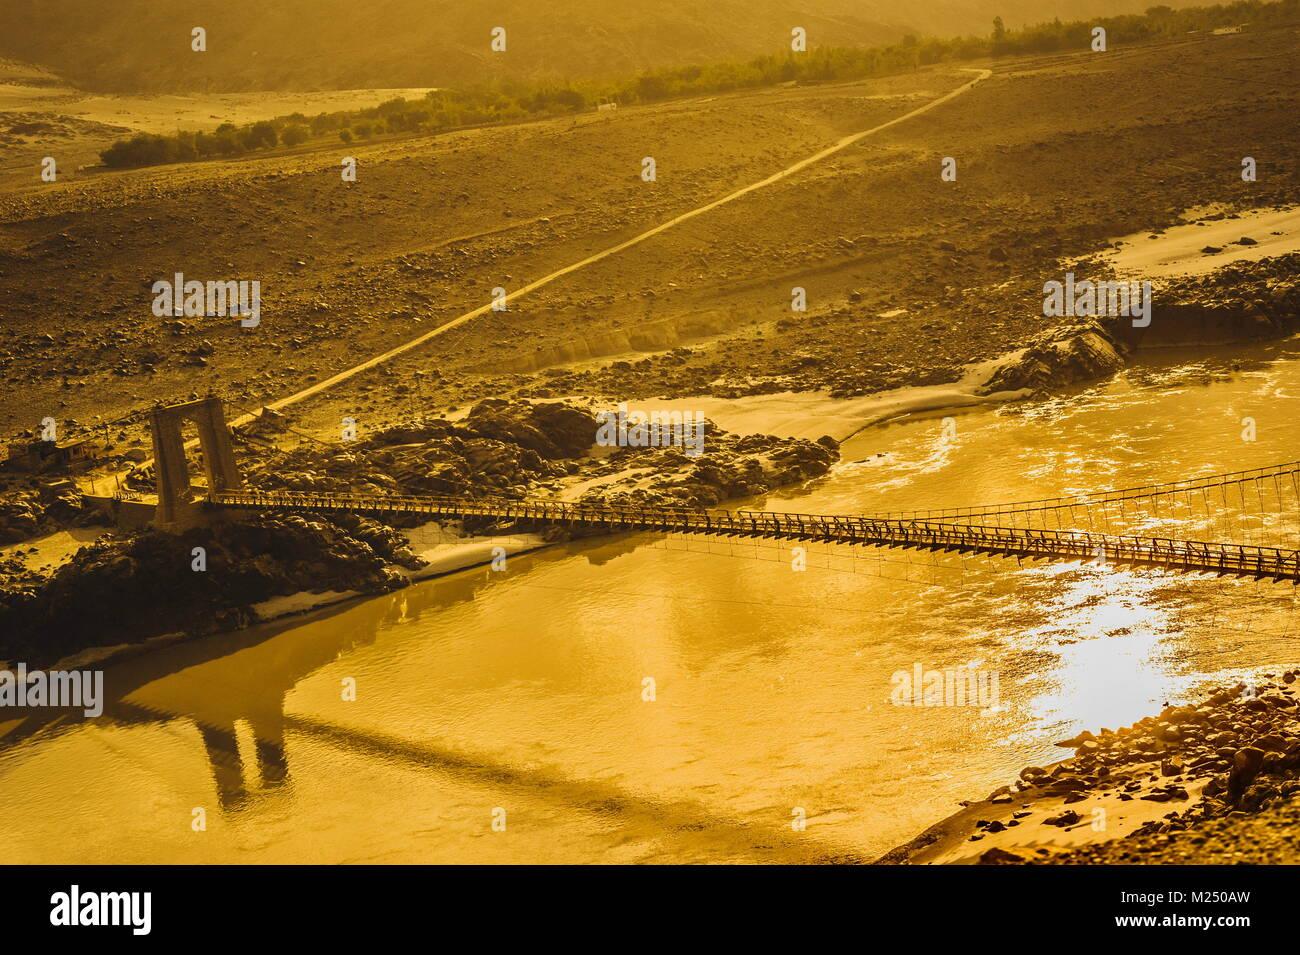 Skardu landform shows desert, river and mountains. Gilgit-Baltistan, Pakistan. - Stock Image